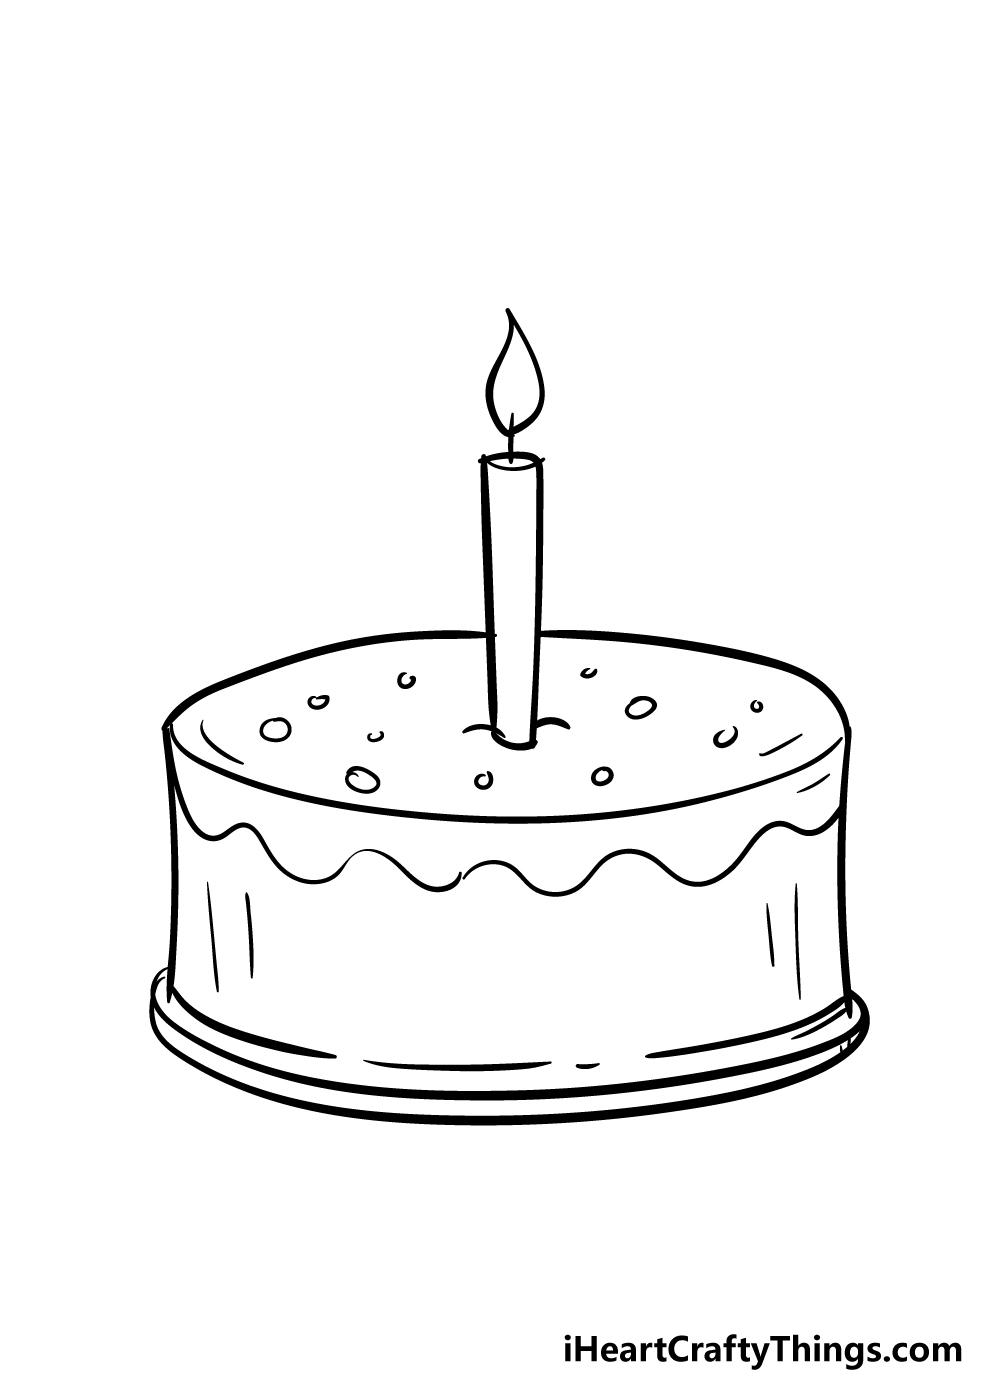 cake drawing step 5